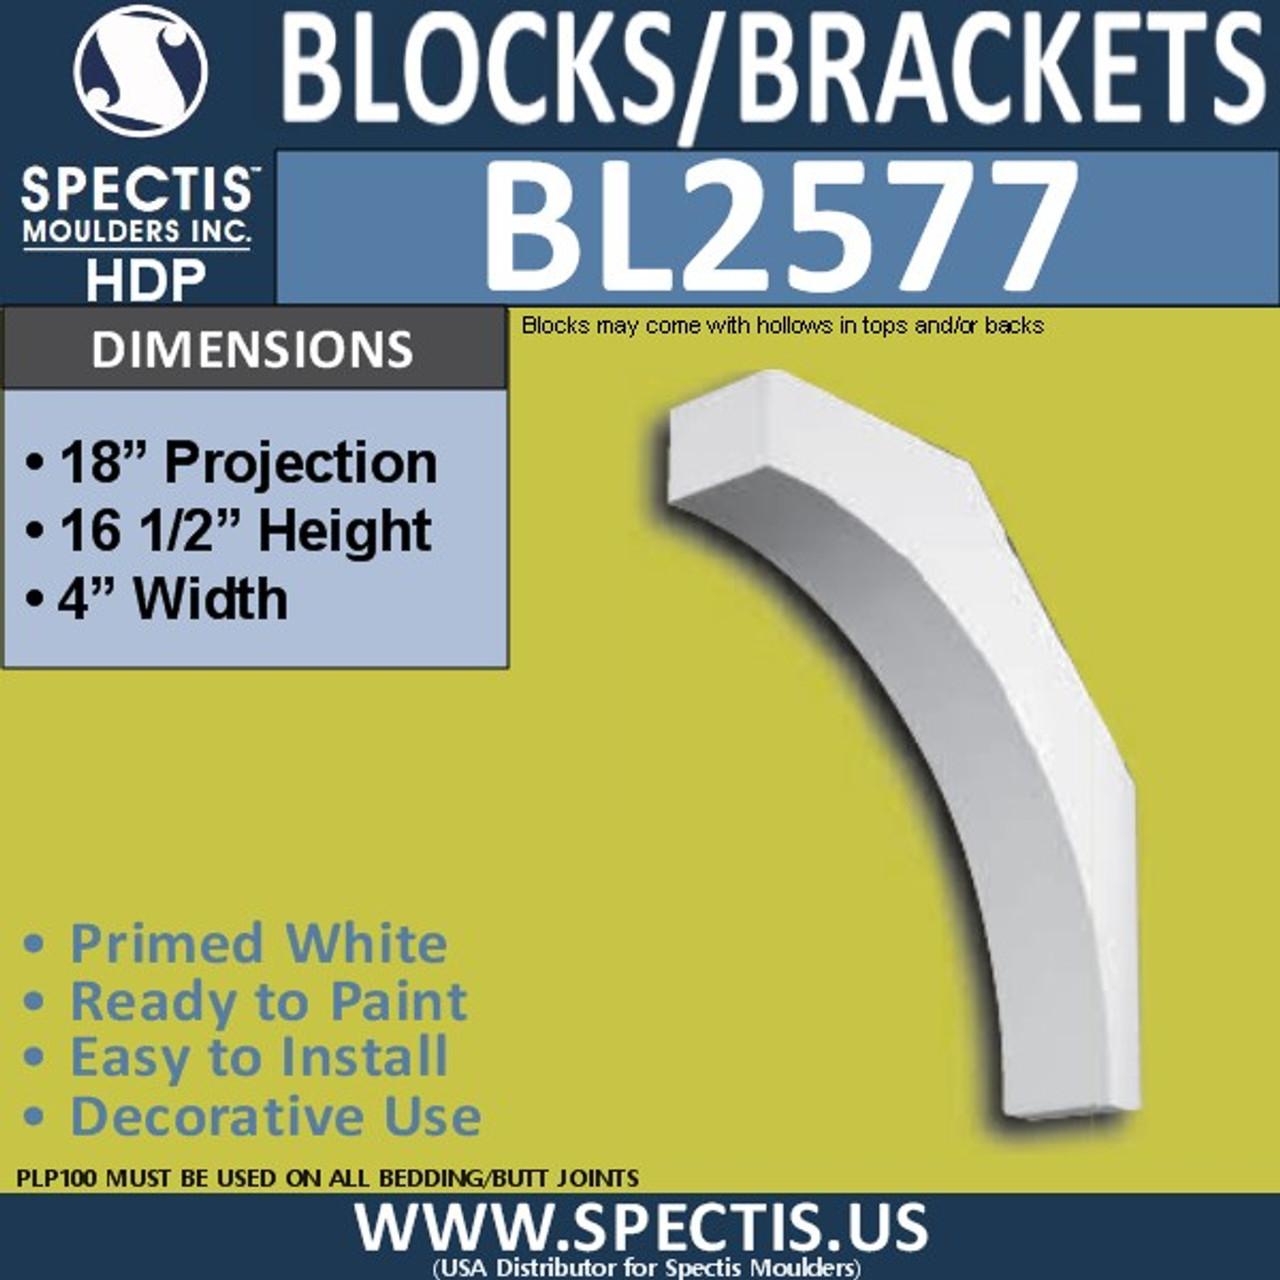 "BL2577 Eave Block or Bracket 4""W x 16.5""H x 18"" P"